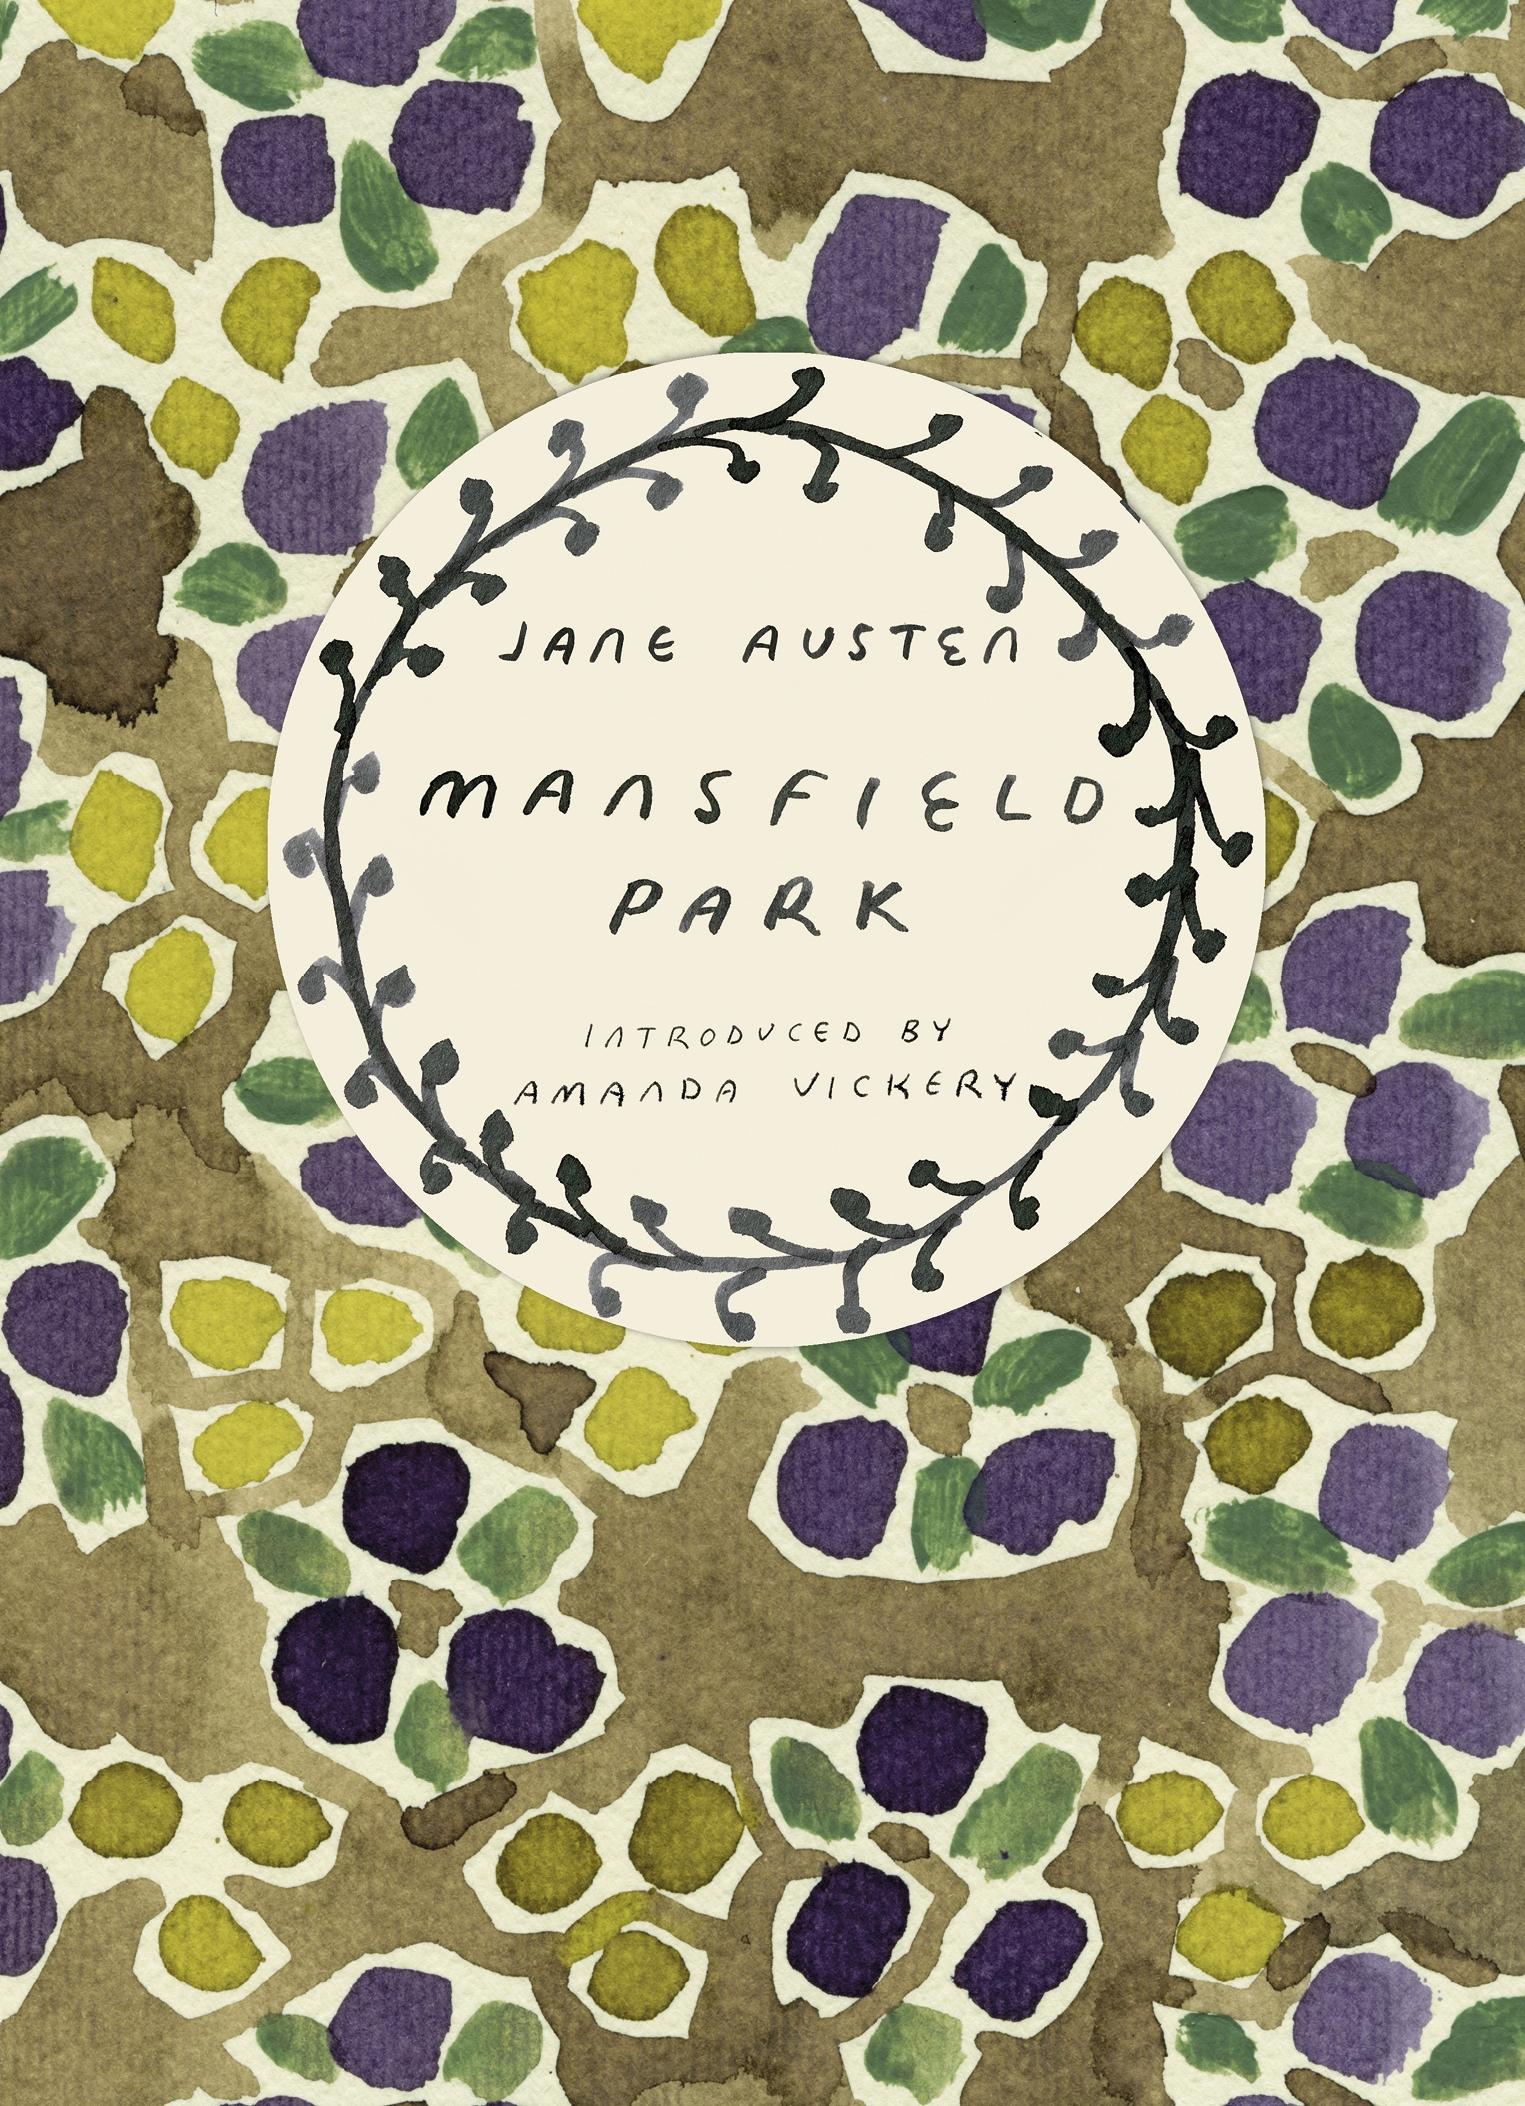 Mansfield Park (Vintage Classics Austen Series) by Jane Austen ...